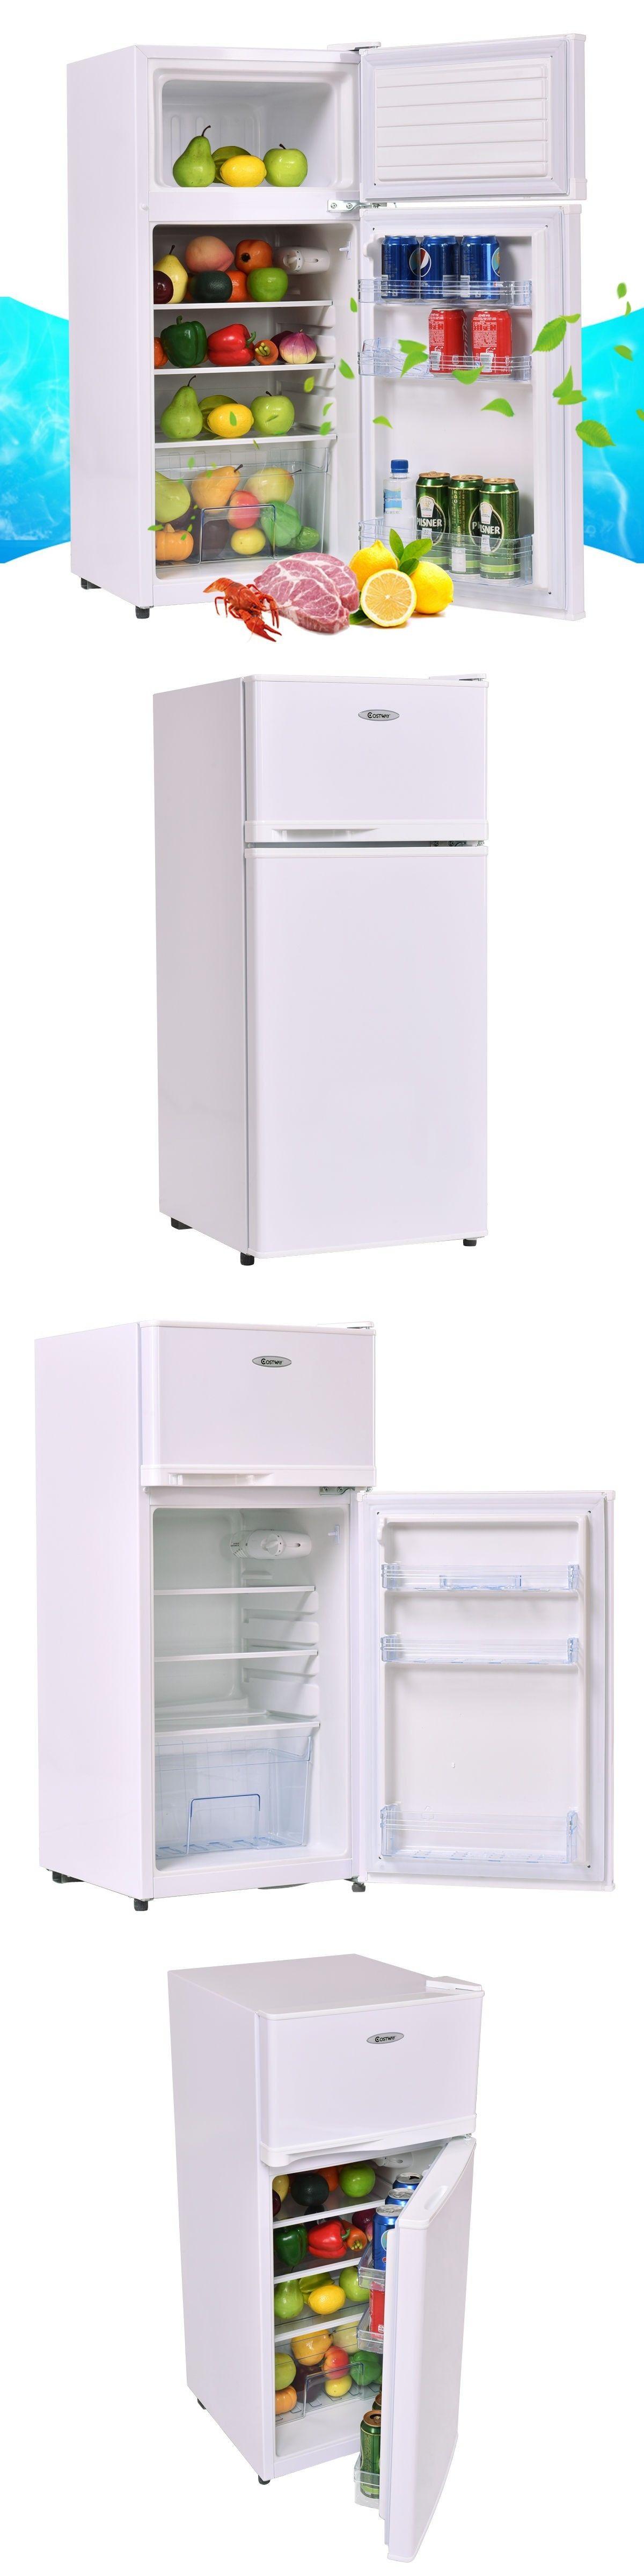 office mini refrigerator. Mini Fridges 71262: Refrigerator Freezer Compact Fridge Office Dorm Small Cooler Portable Hotel - .